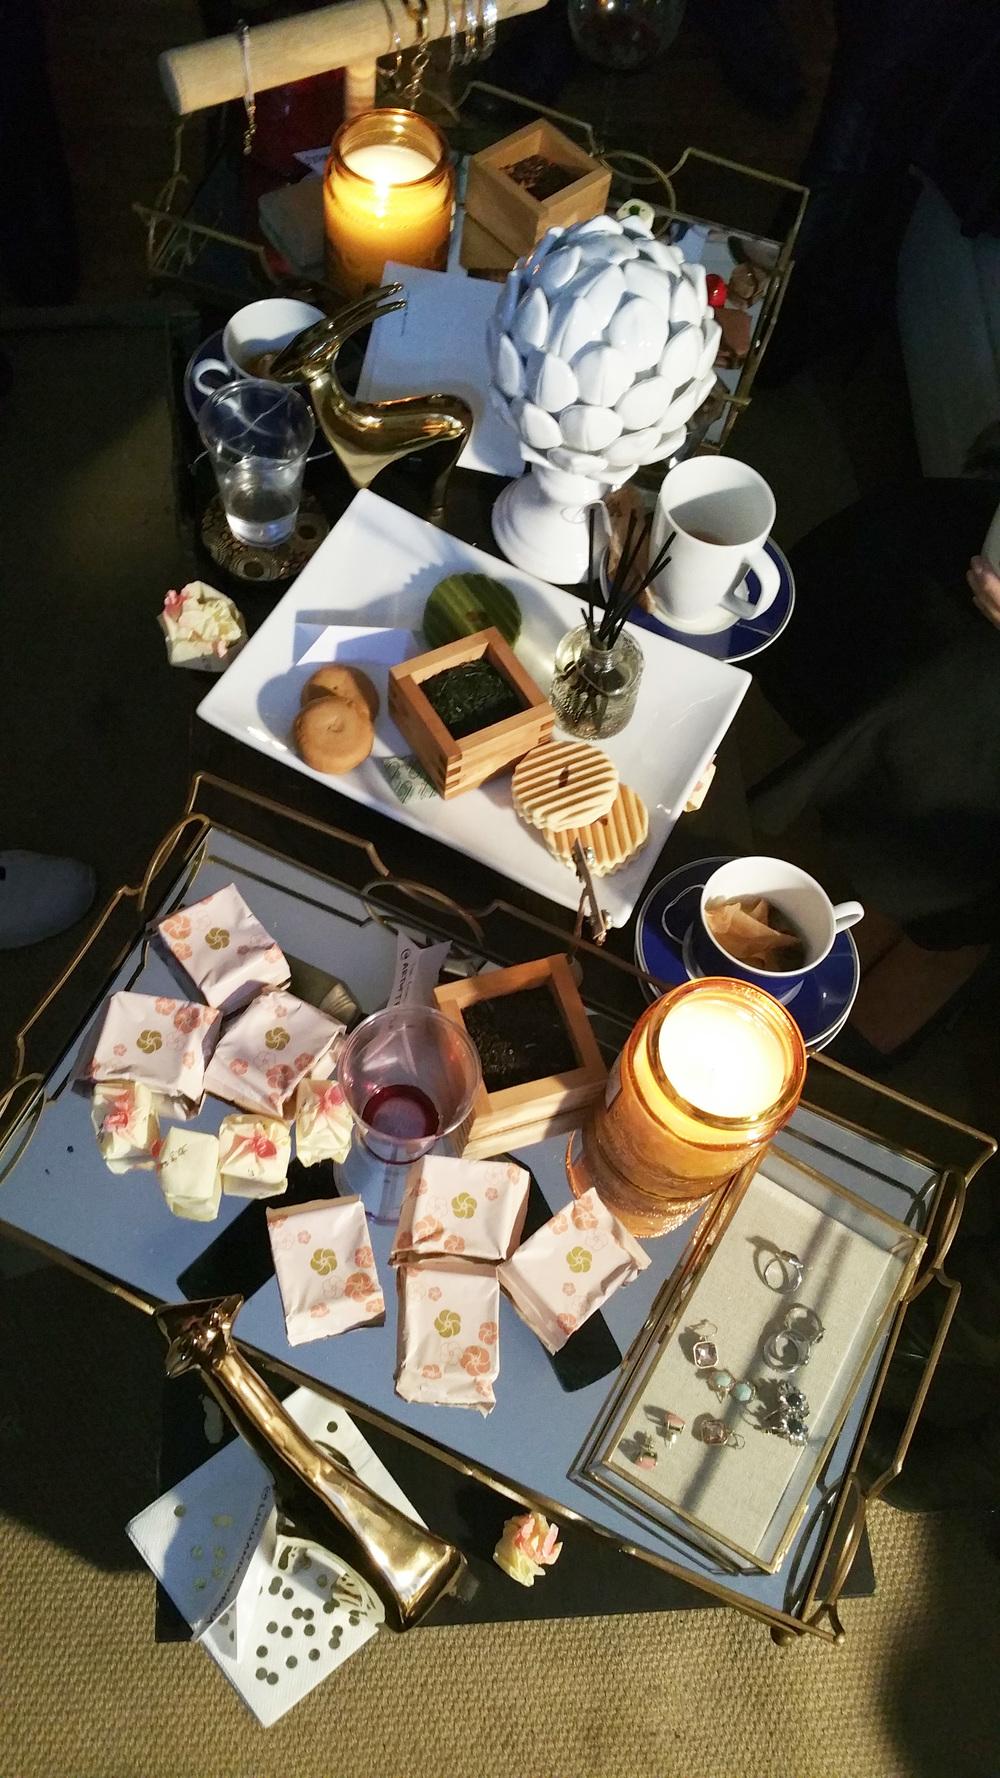 [Tea:  Art of Tea , Desserts:  Minamoto Kitchoan  , Wine:  Chloe Wine Co. , Candes:  Voluspa , Table + Decor:  Lulu + Georgia , Jewelry:  Chloe + Isabel ]